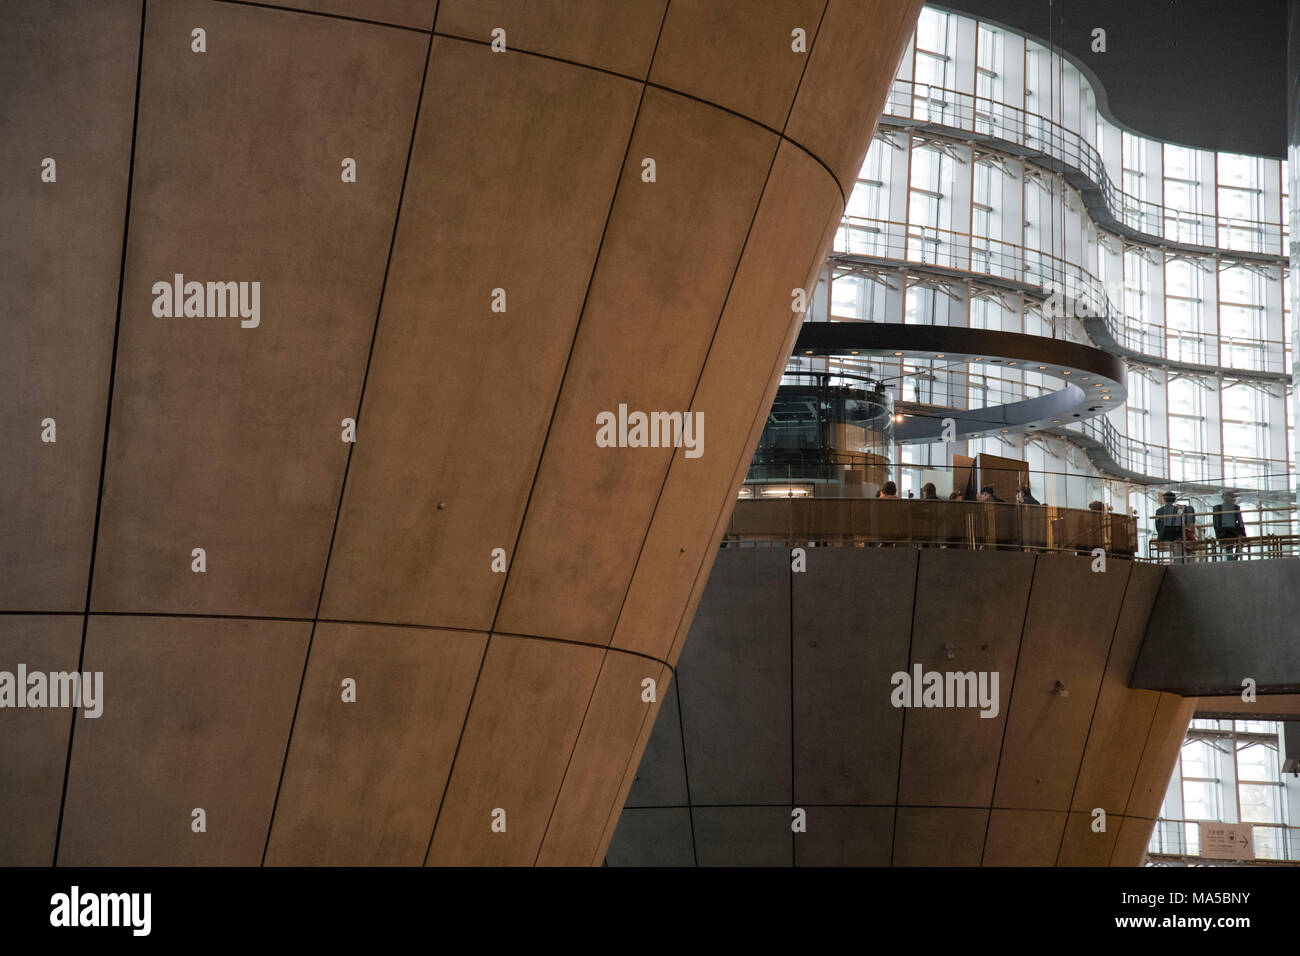 Asia, Japan, Nihon, Nippon, Tokyo, Minato, traditional Art centre Tokyo - Stock Image